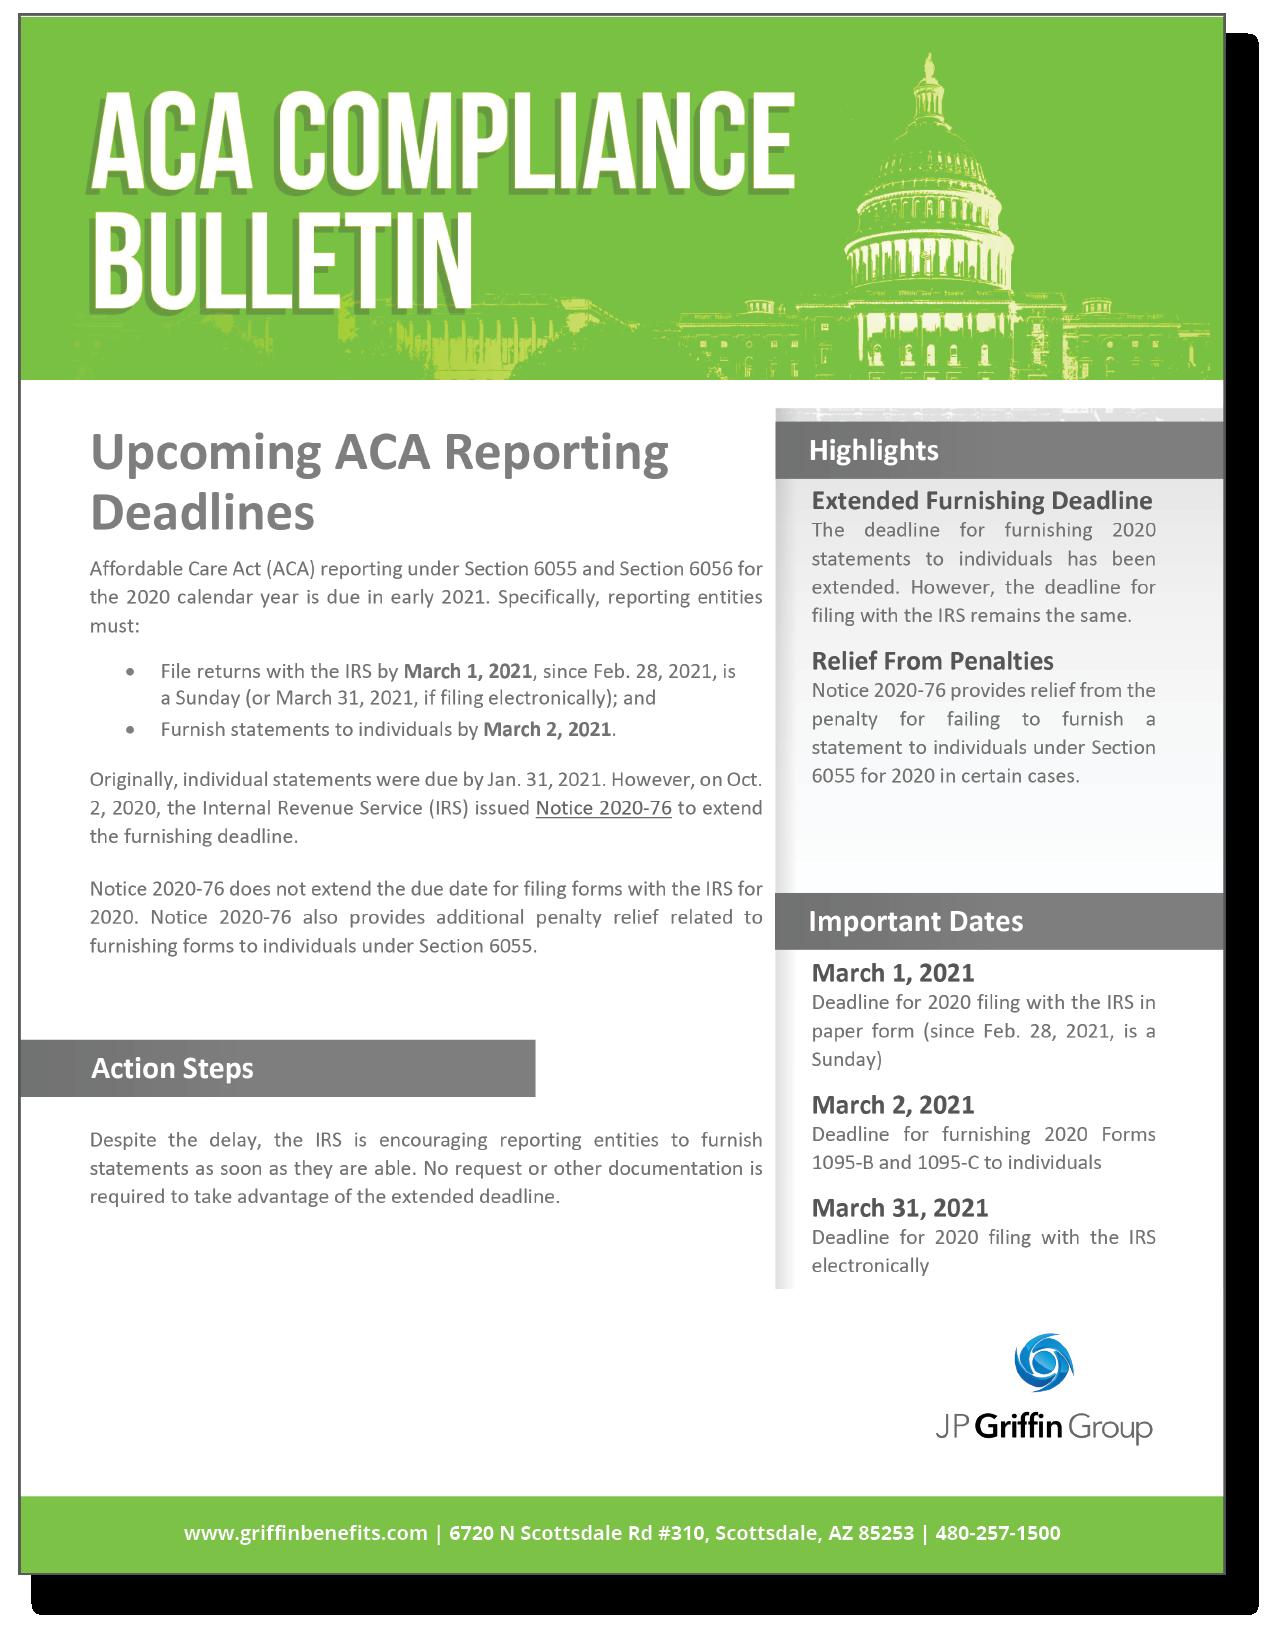 Upcoming ACA Reporting Deadline